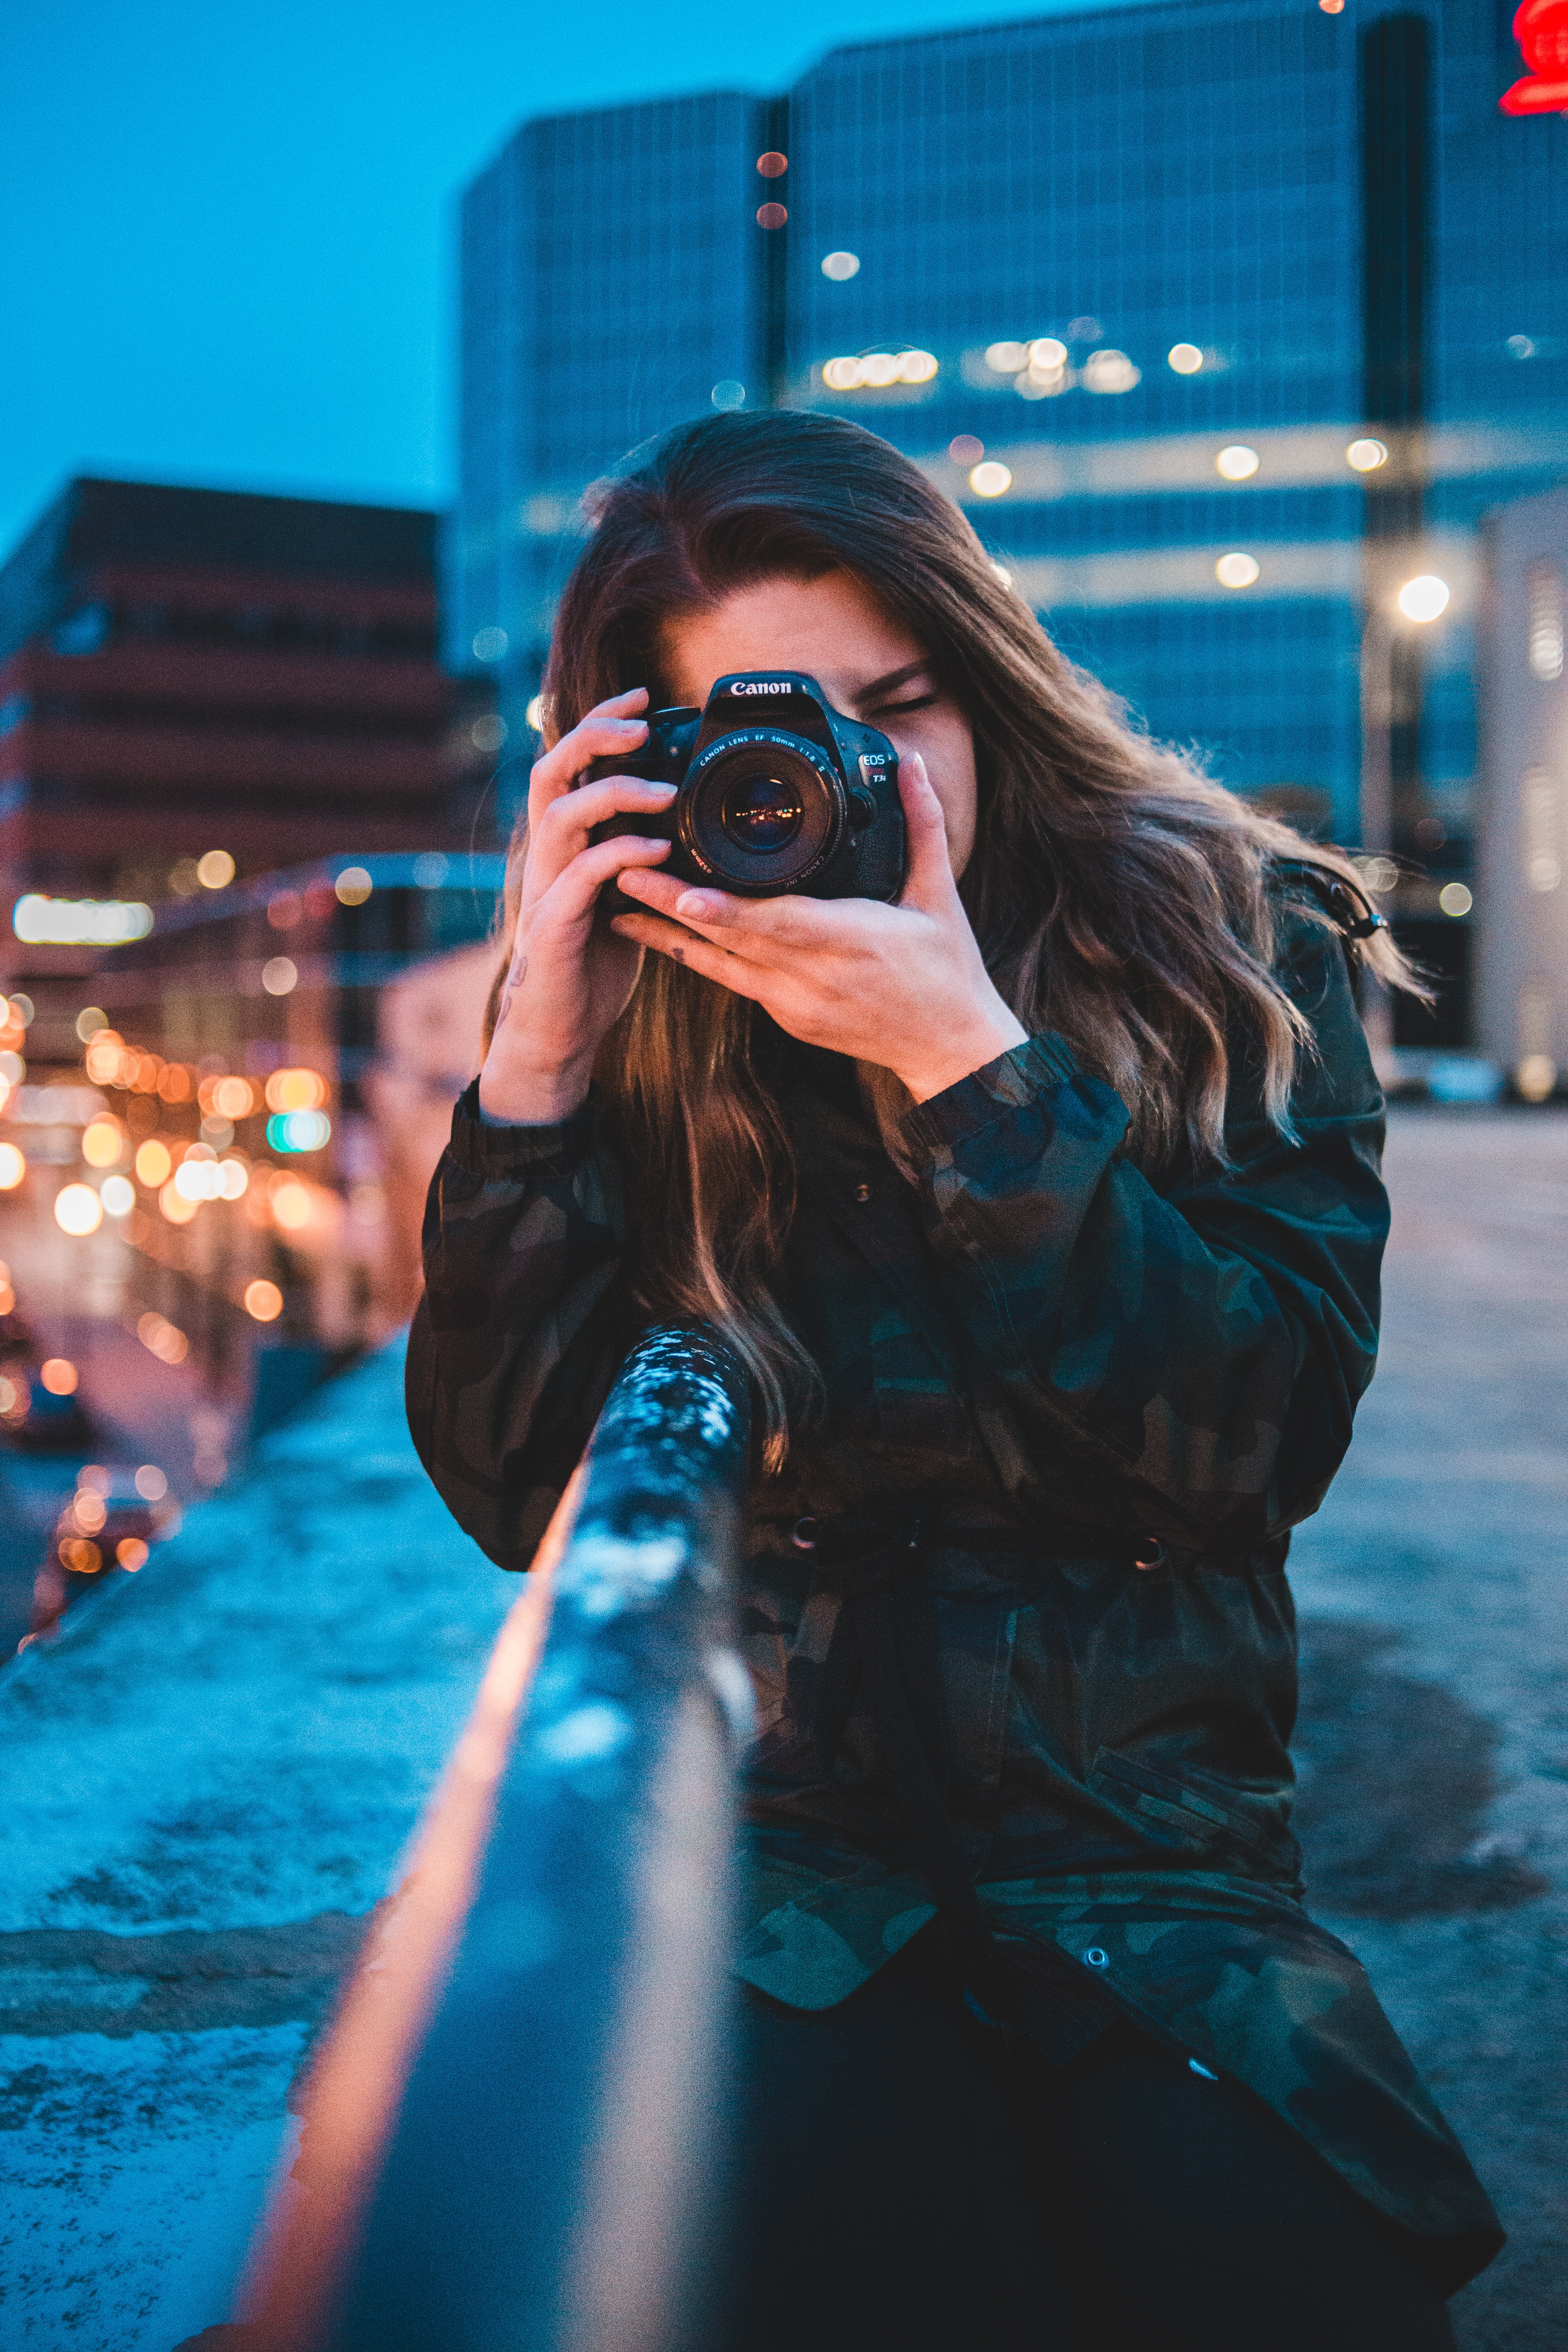 Fotograf?